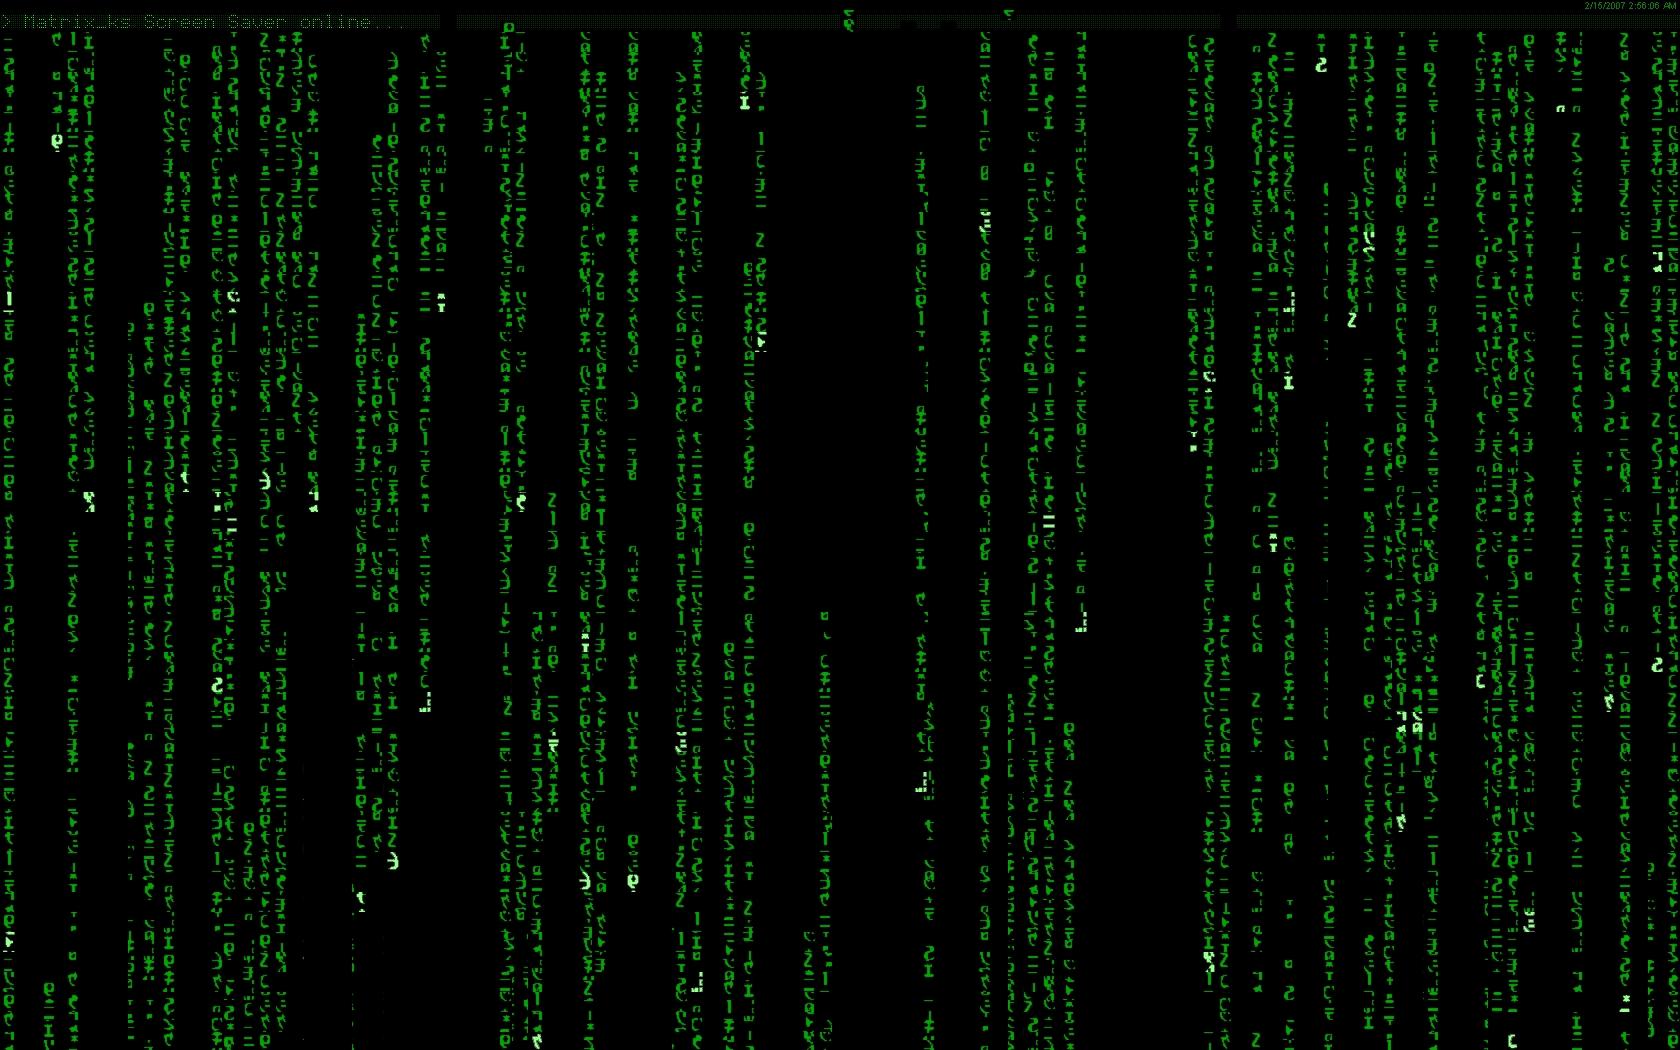 matrix desktop moving backgrounds matrix code animated matrix code 1680x1050